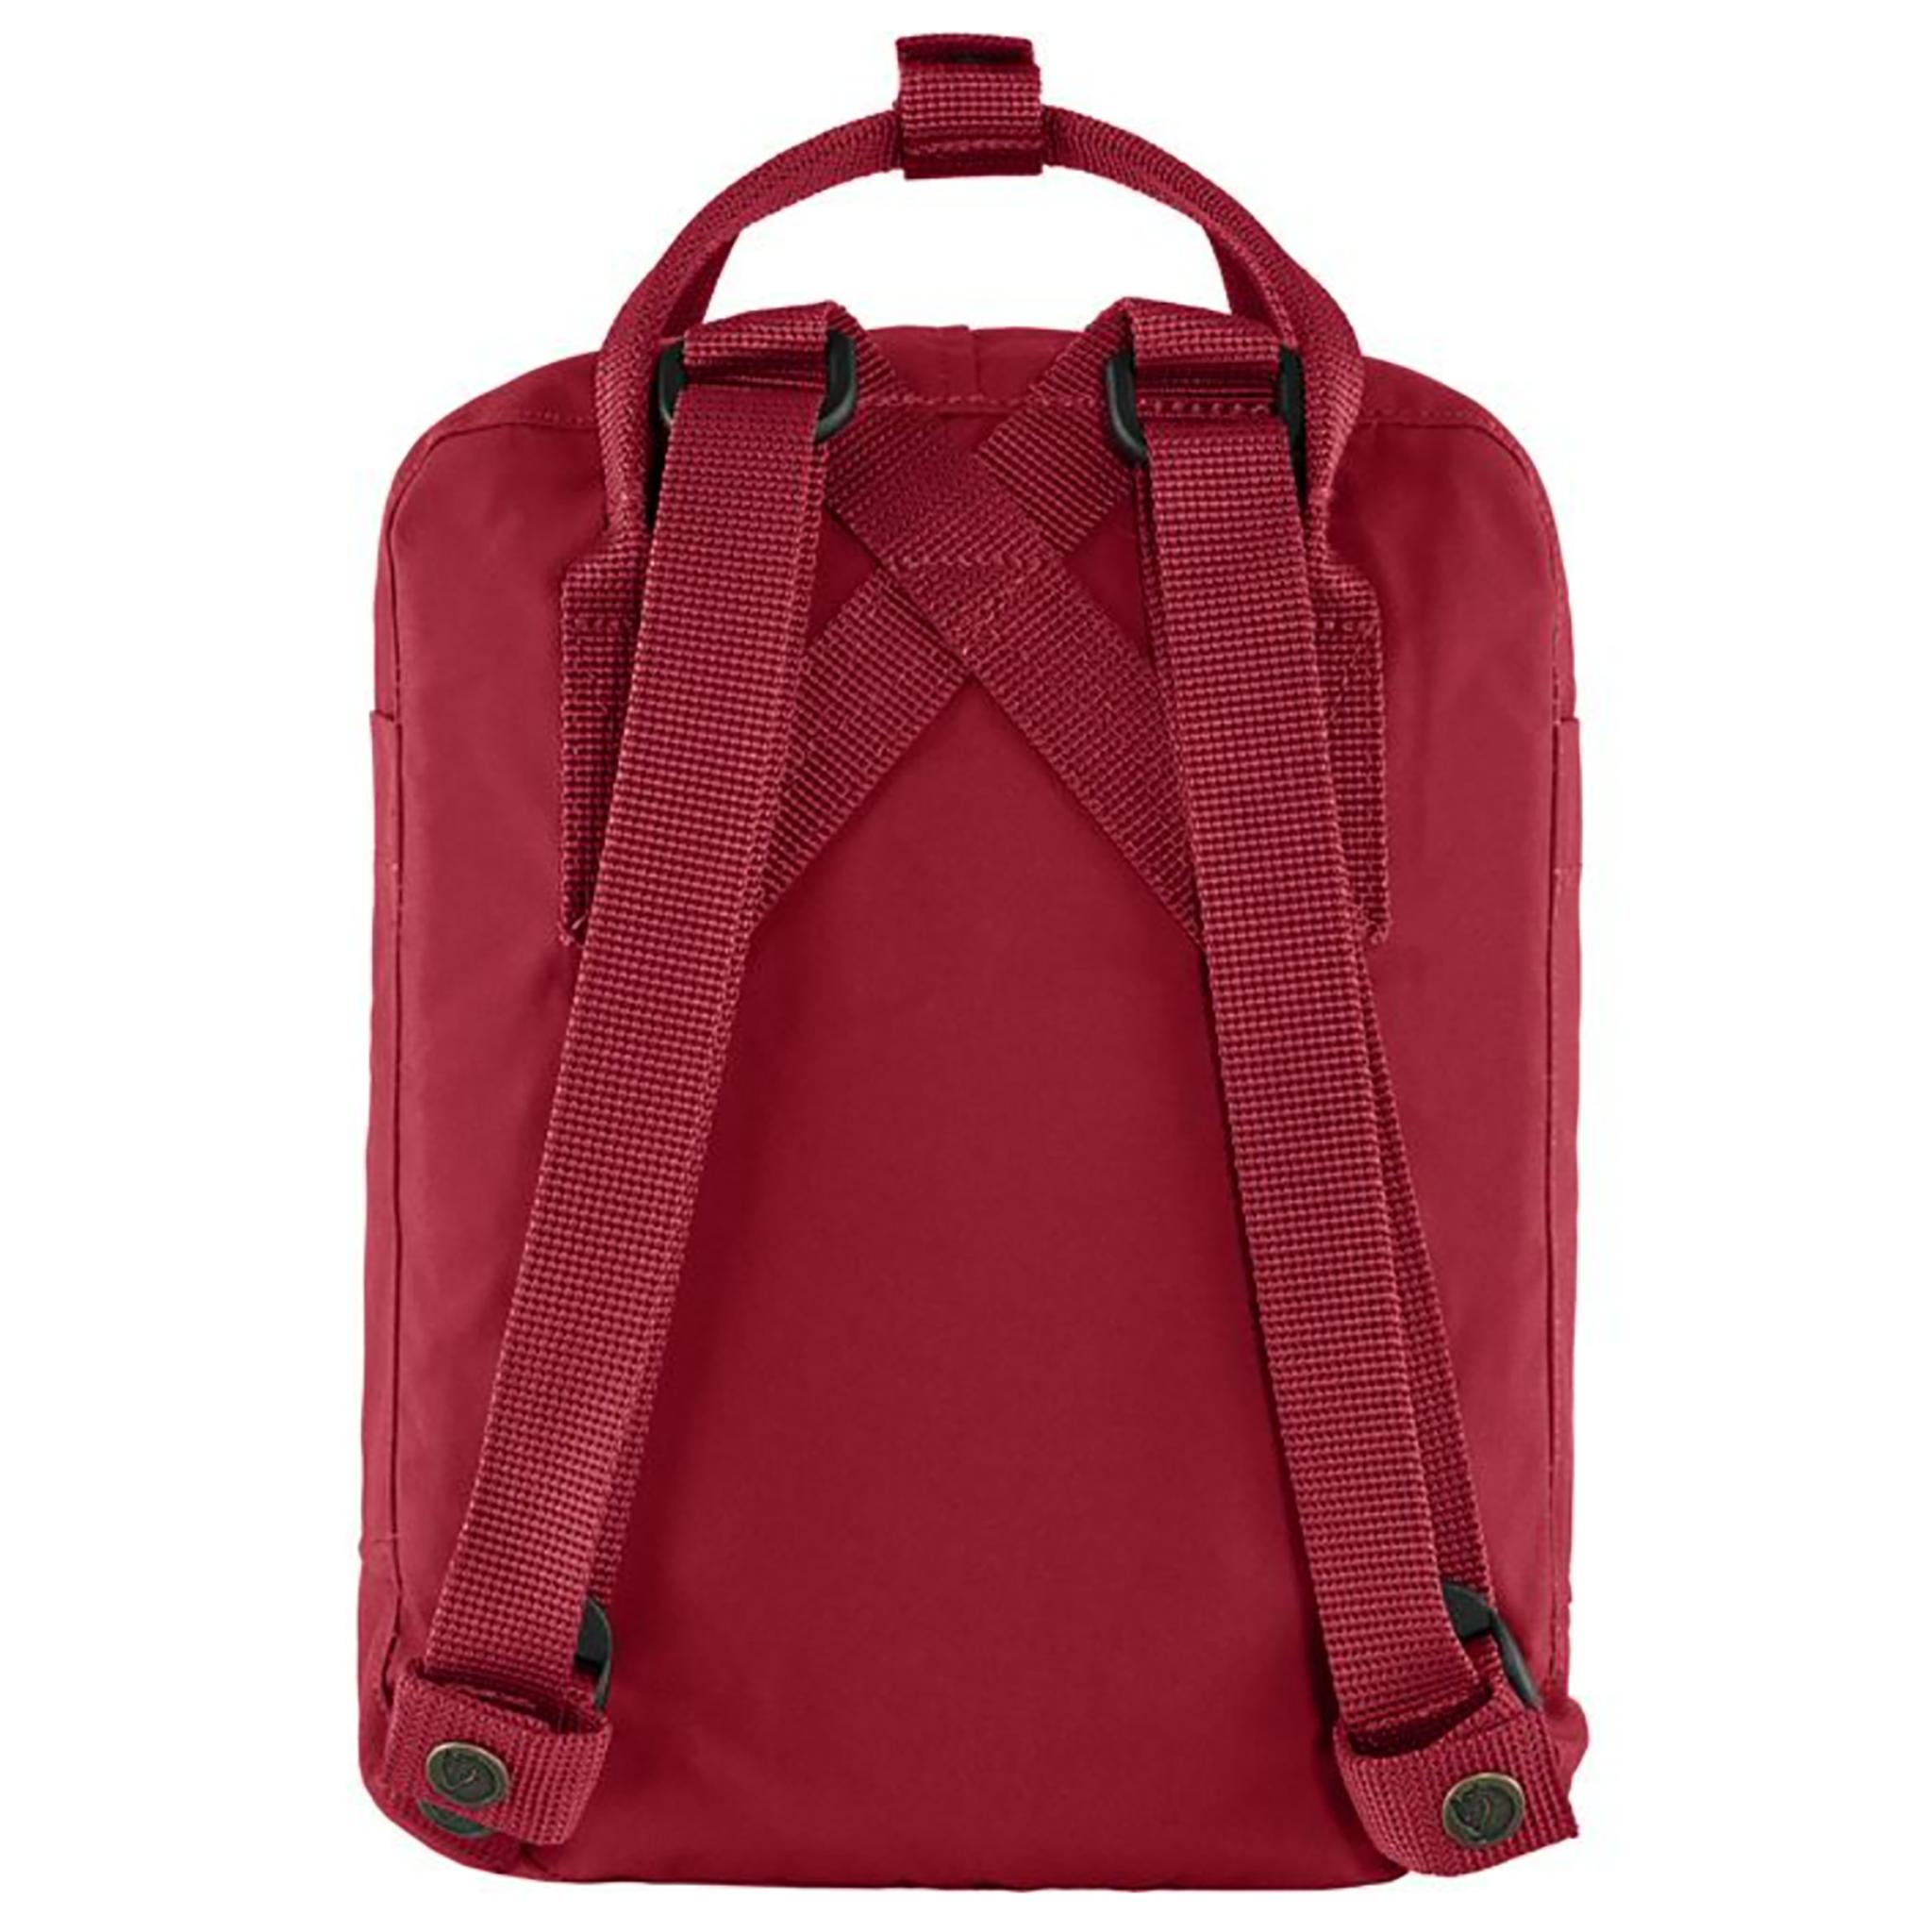 Kanken Mini 325 - Deep Red-2